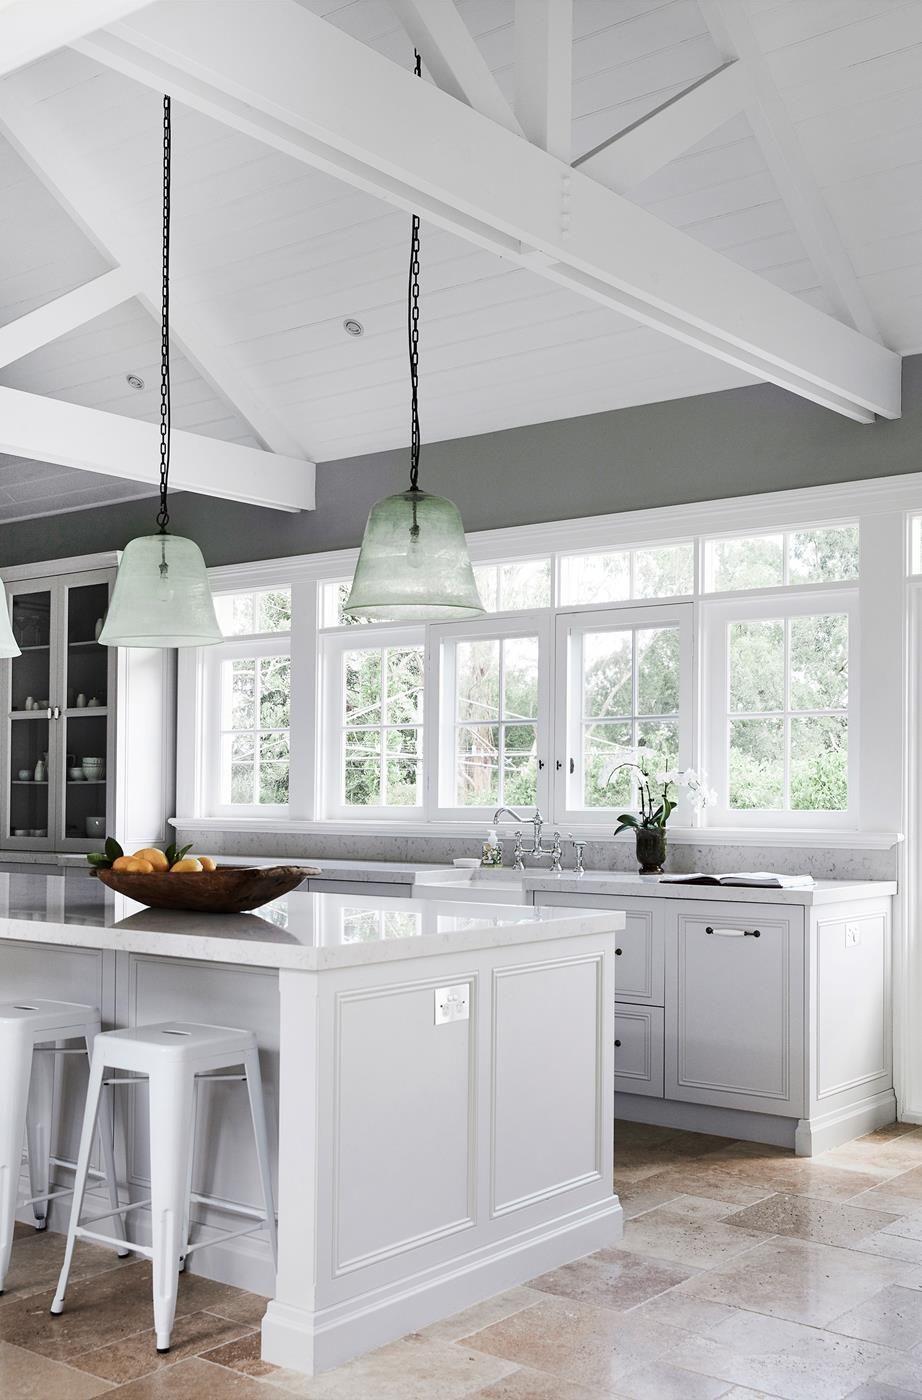 antique white kitchen cabinets antiquewhitekitchencabinetswithwoodfloors country kitchen on kitchen cabinets design id=91271